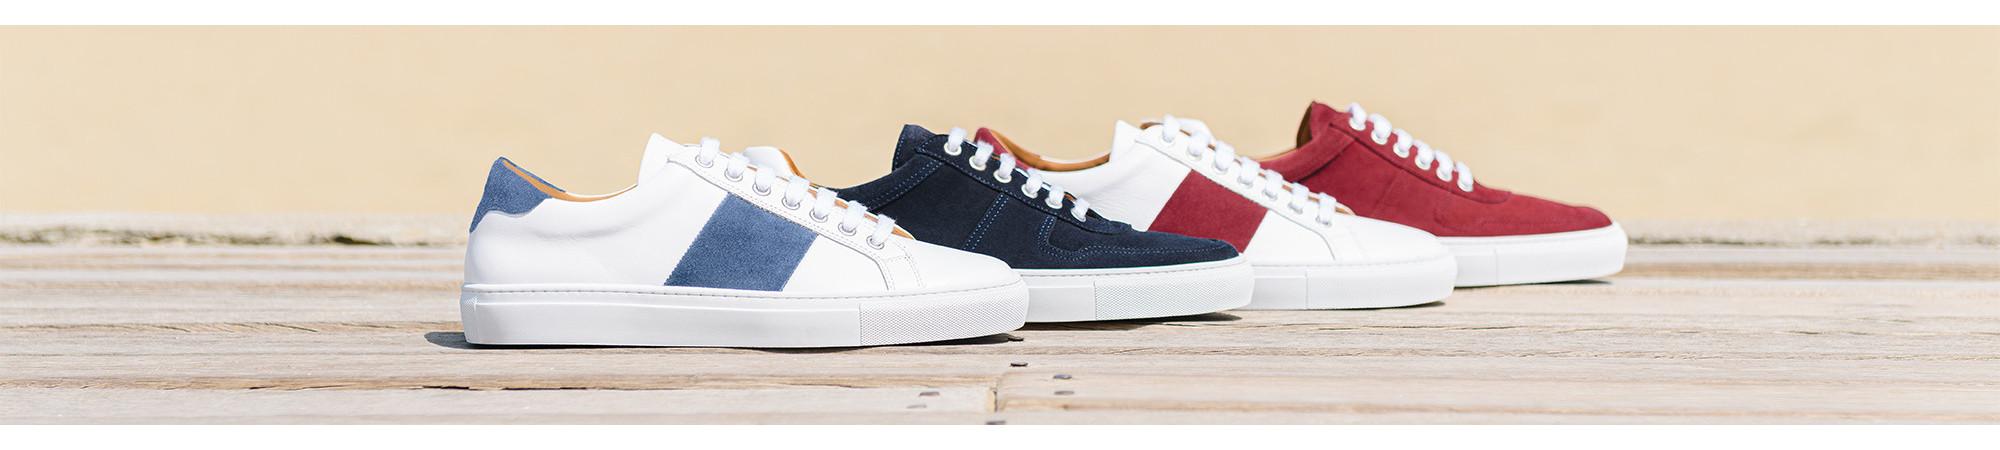 The smart man's sneaker - Emling Sneakers